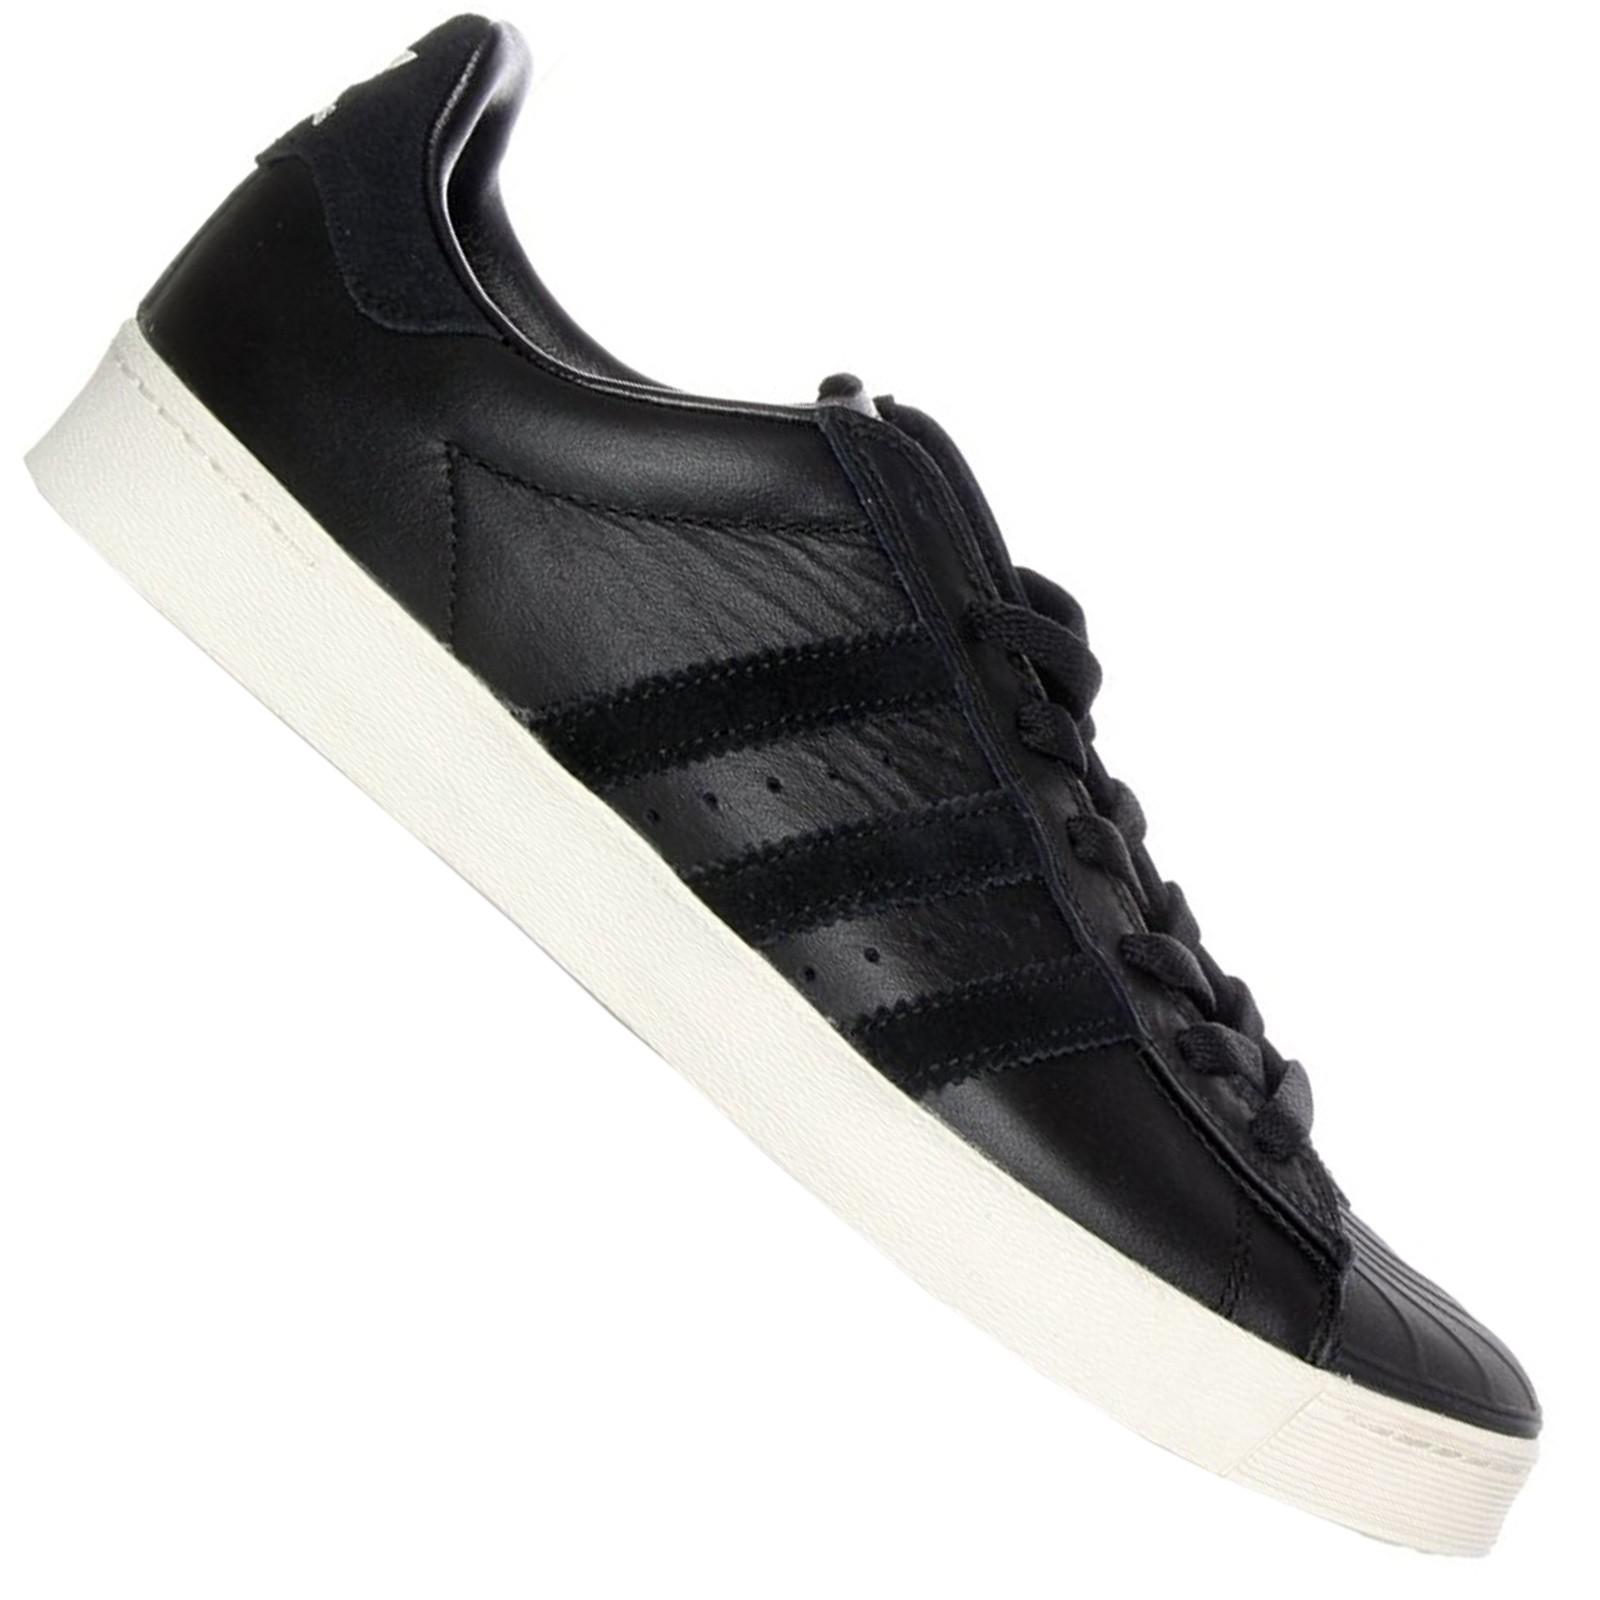 official photos 1df81 a46e6 Details about Adidas Originals Superstar Vulc Adv Trainers Shoes Leather  Black Classic